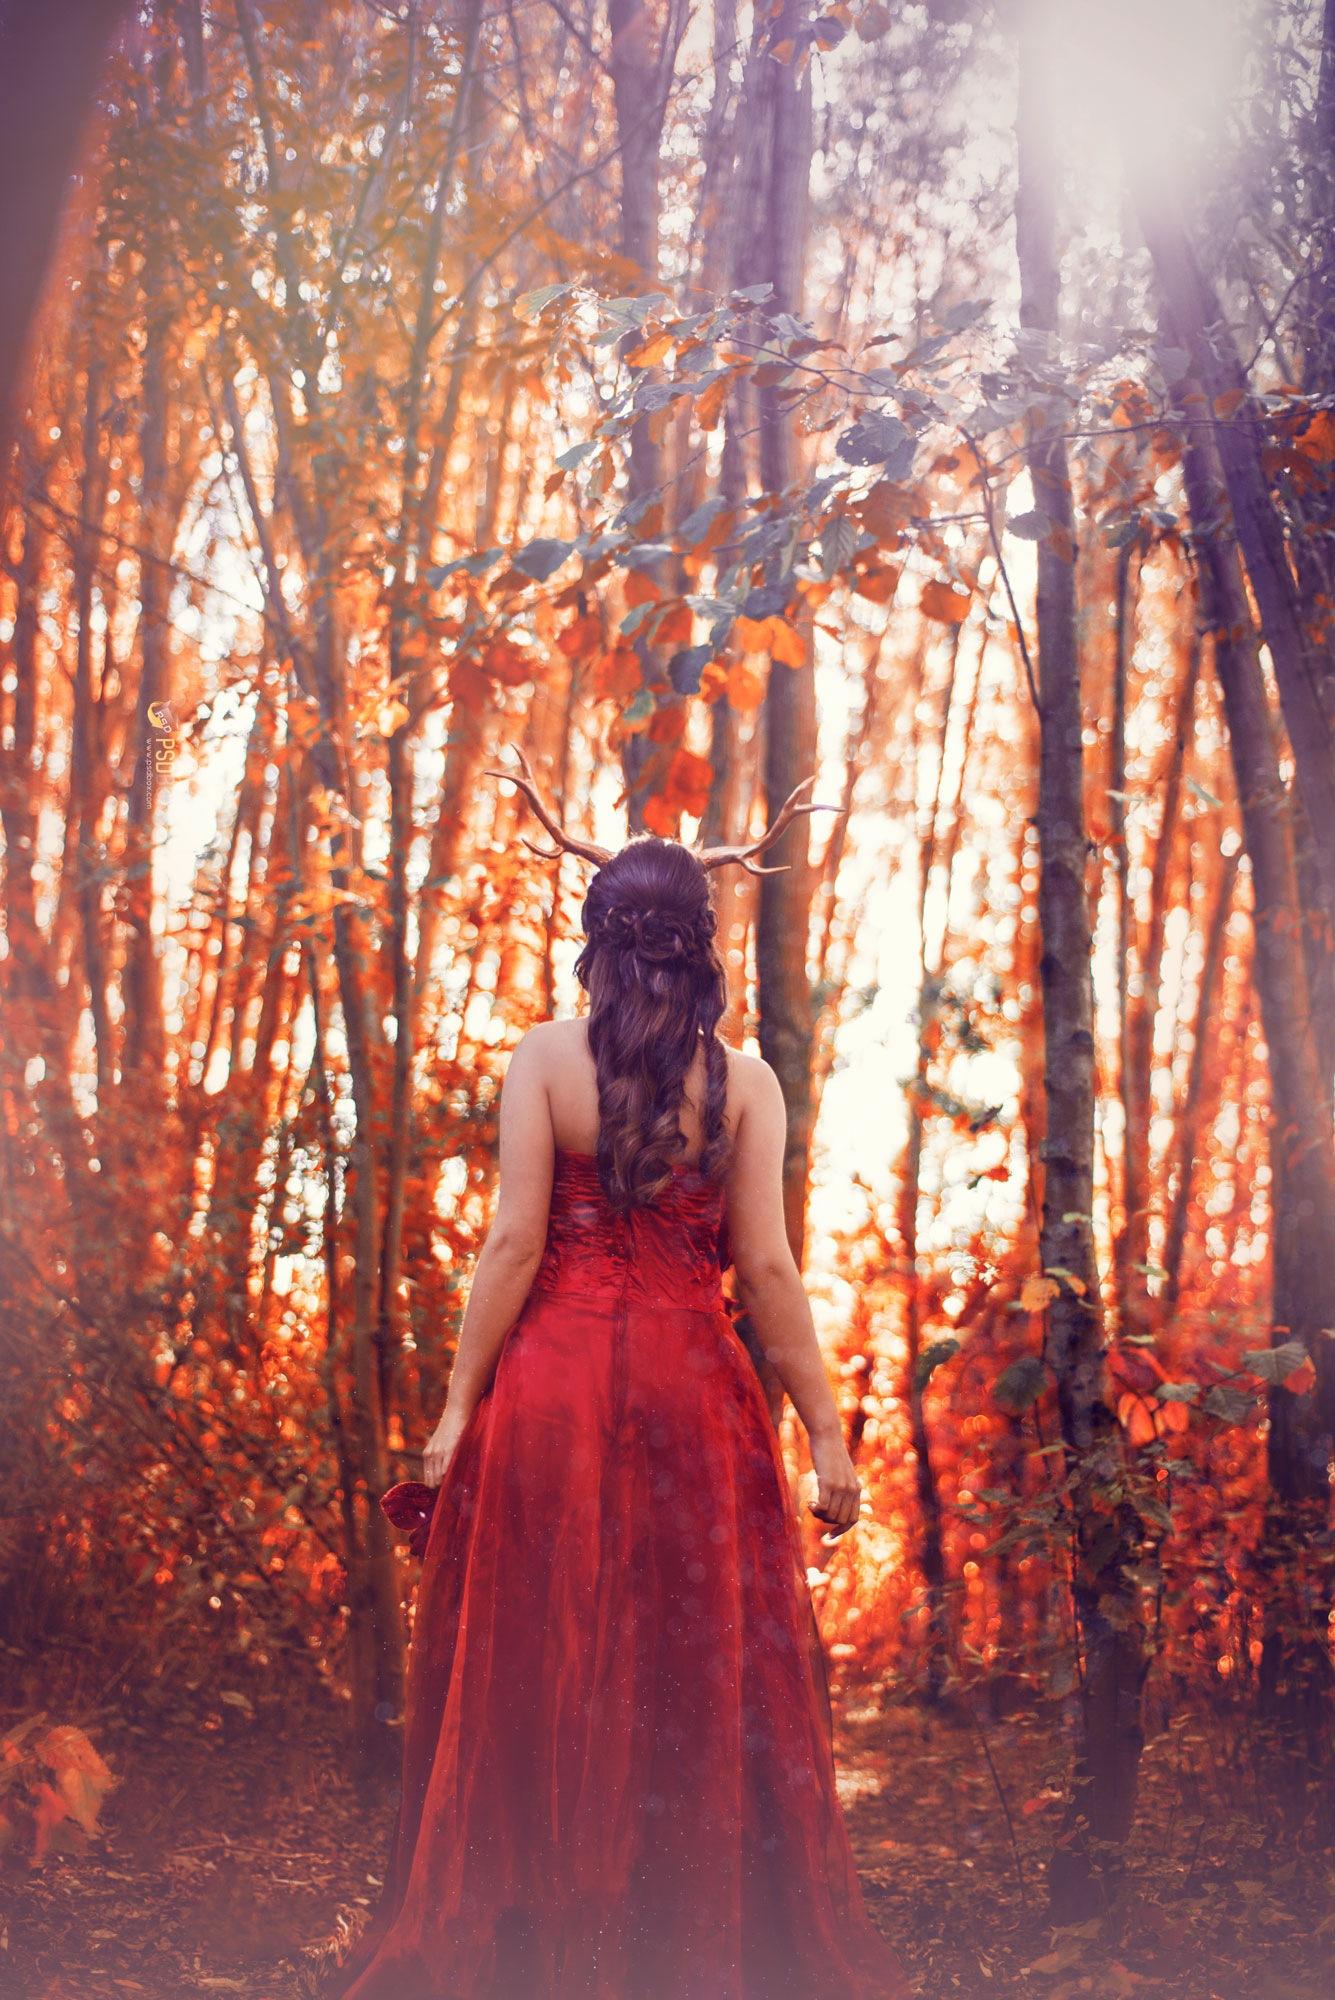 Autumn is here by Original Cin